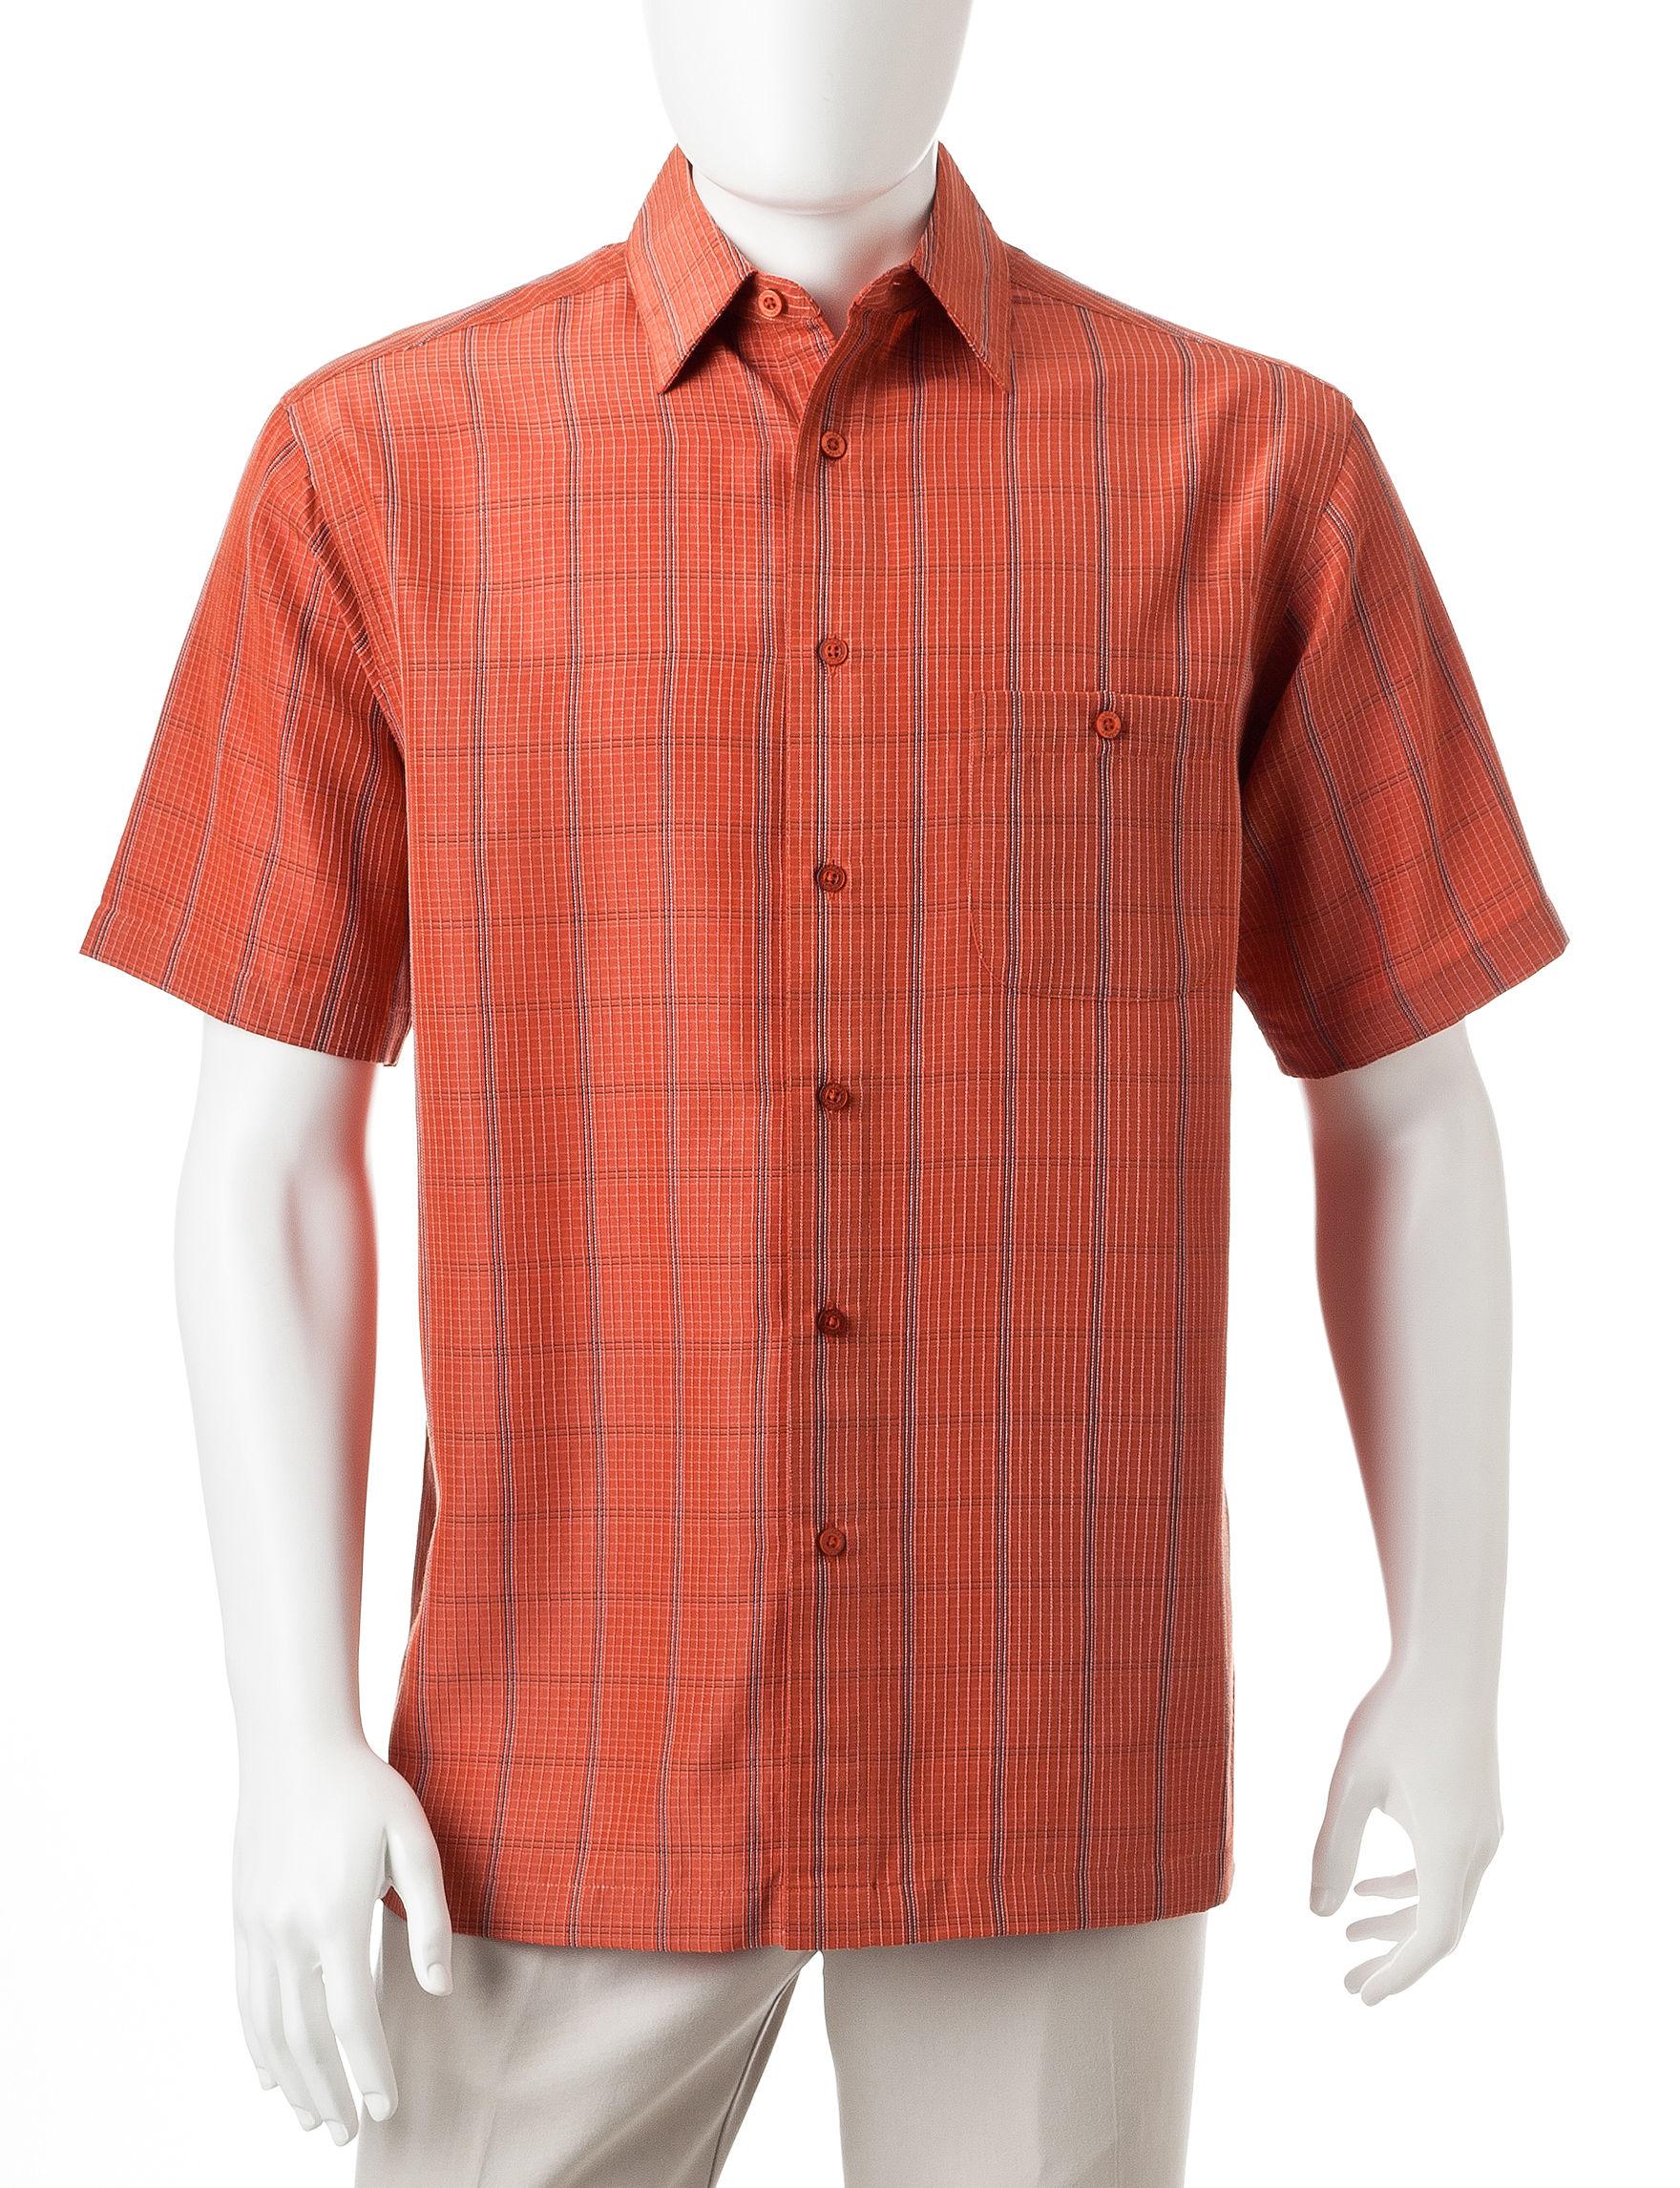 Haggar Ginger Casual Button Down Shirts